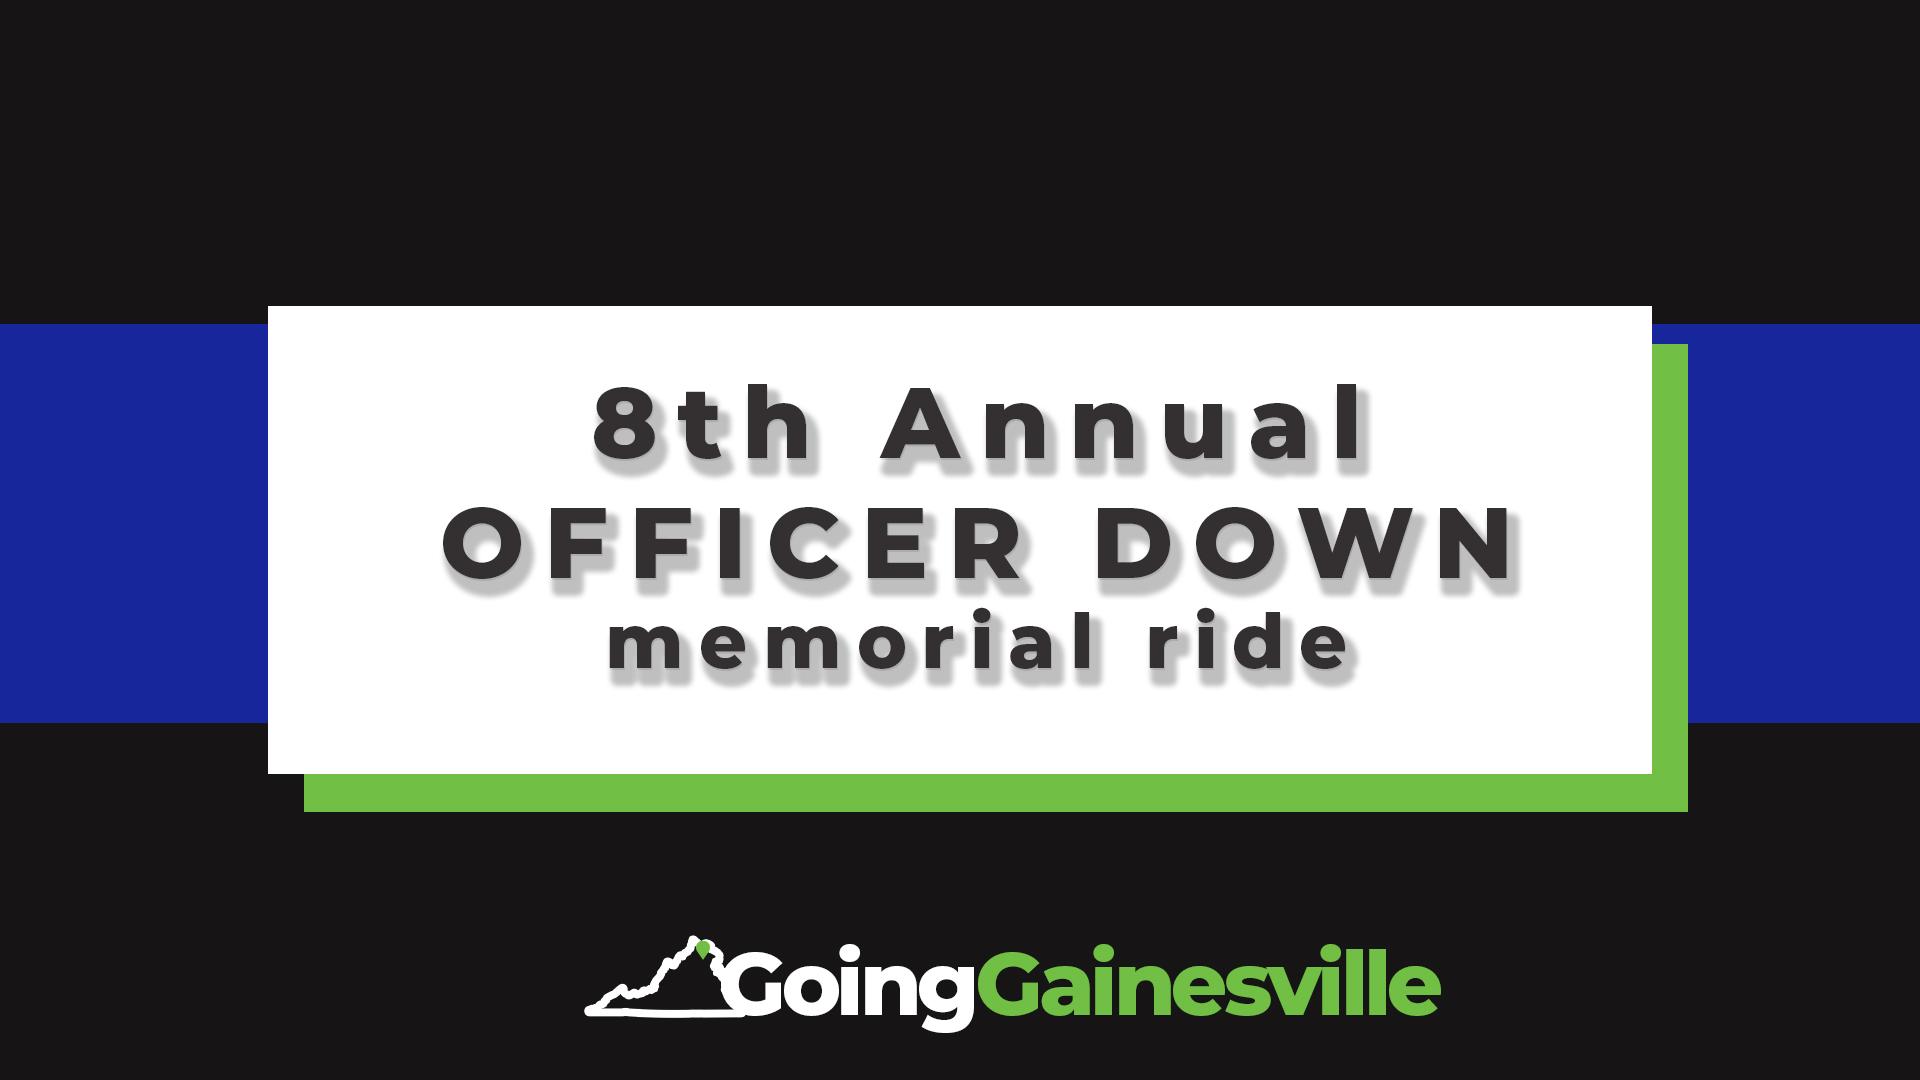 2019 8th Annual Officer Down Memorial Ride